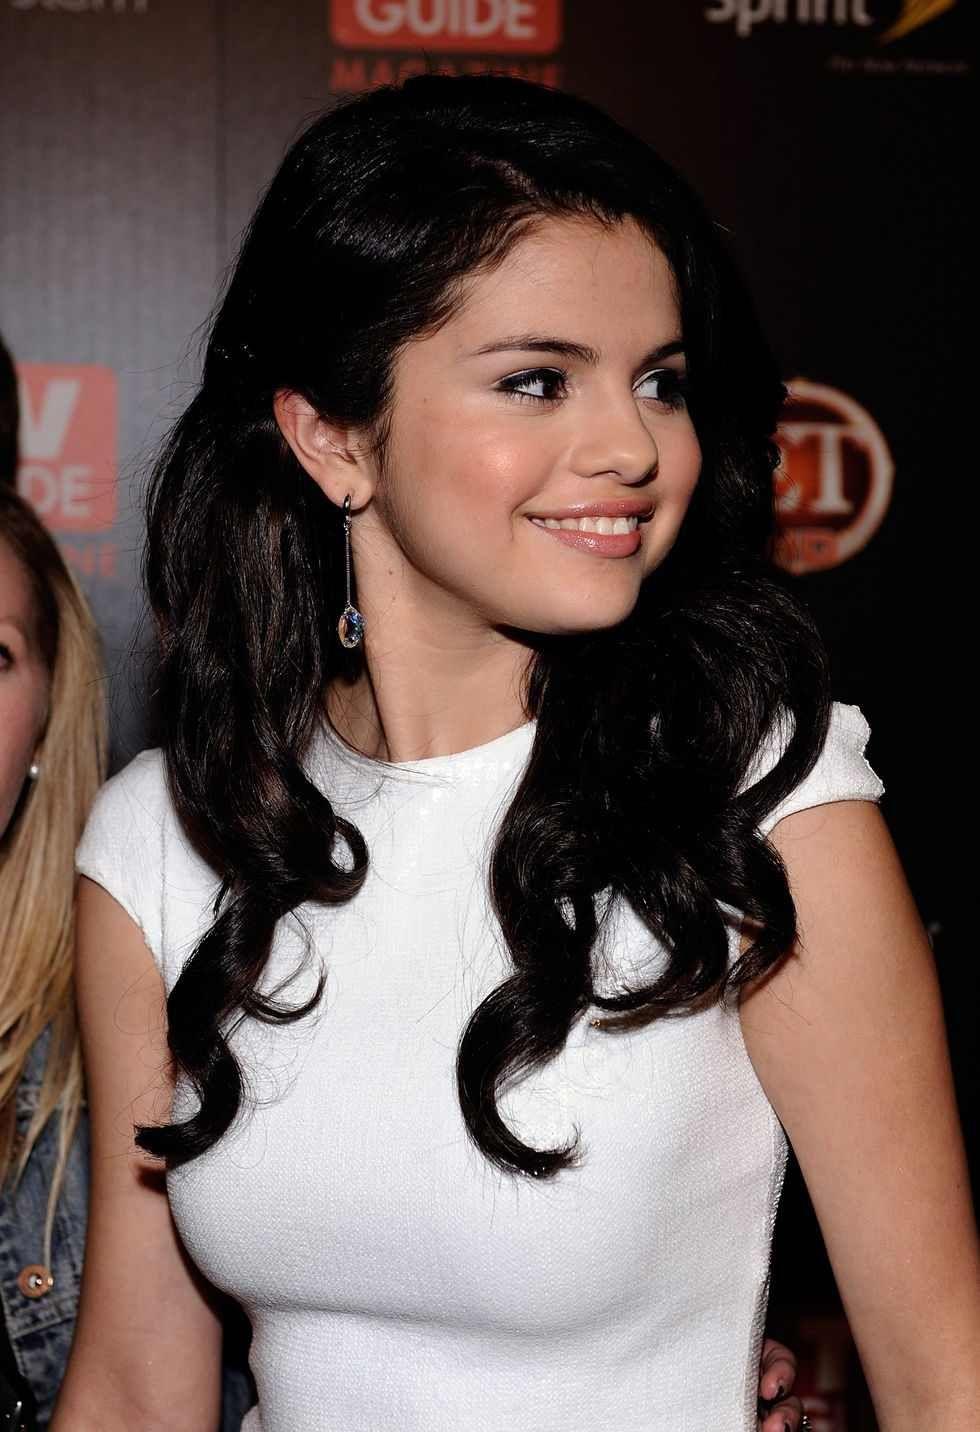 Why Is Selena Gomez So Hot photo 23